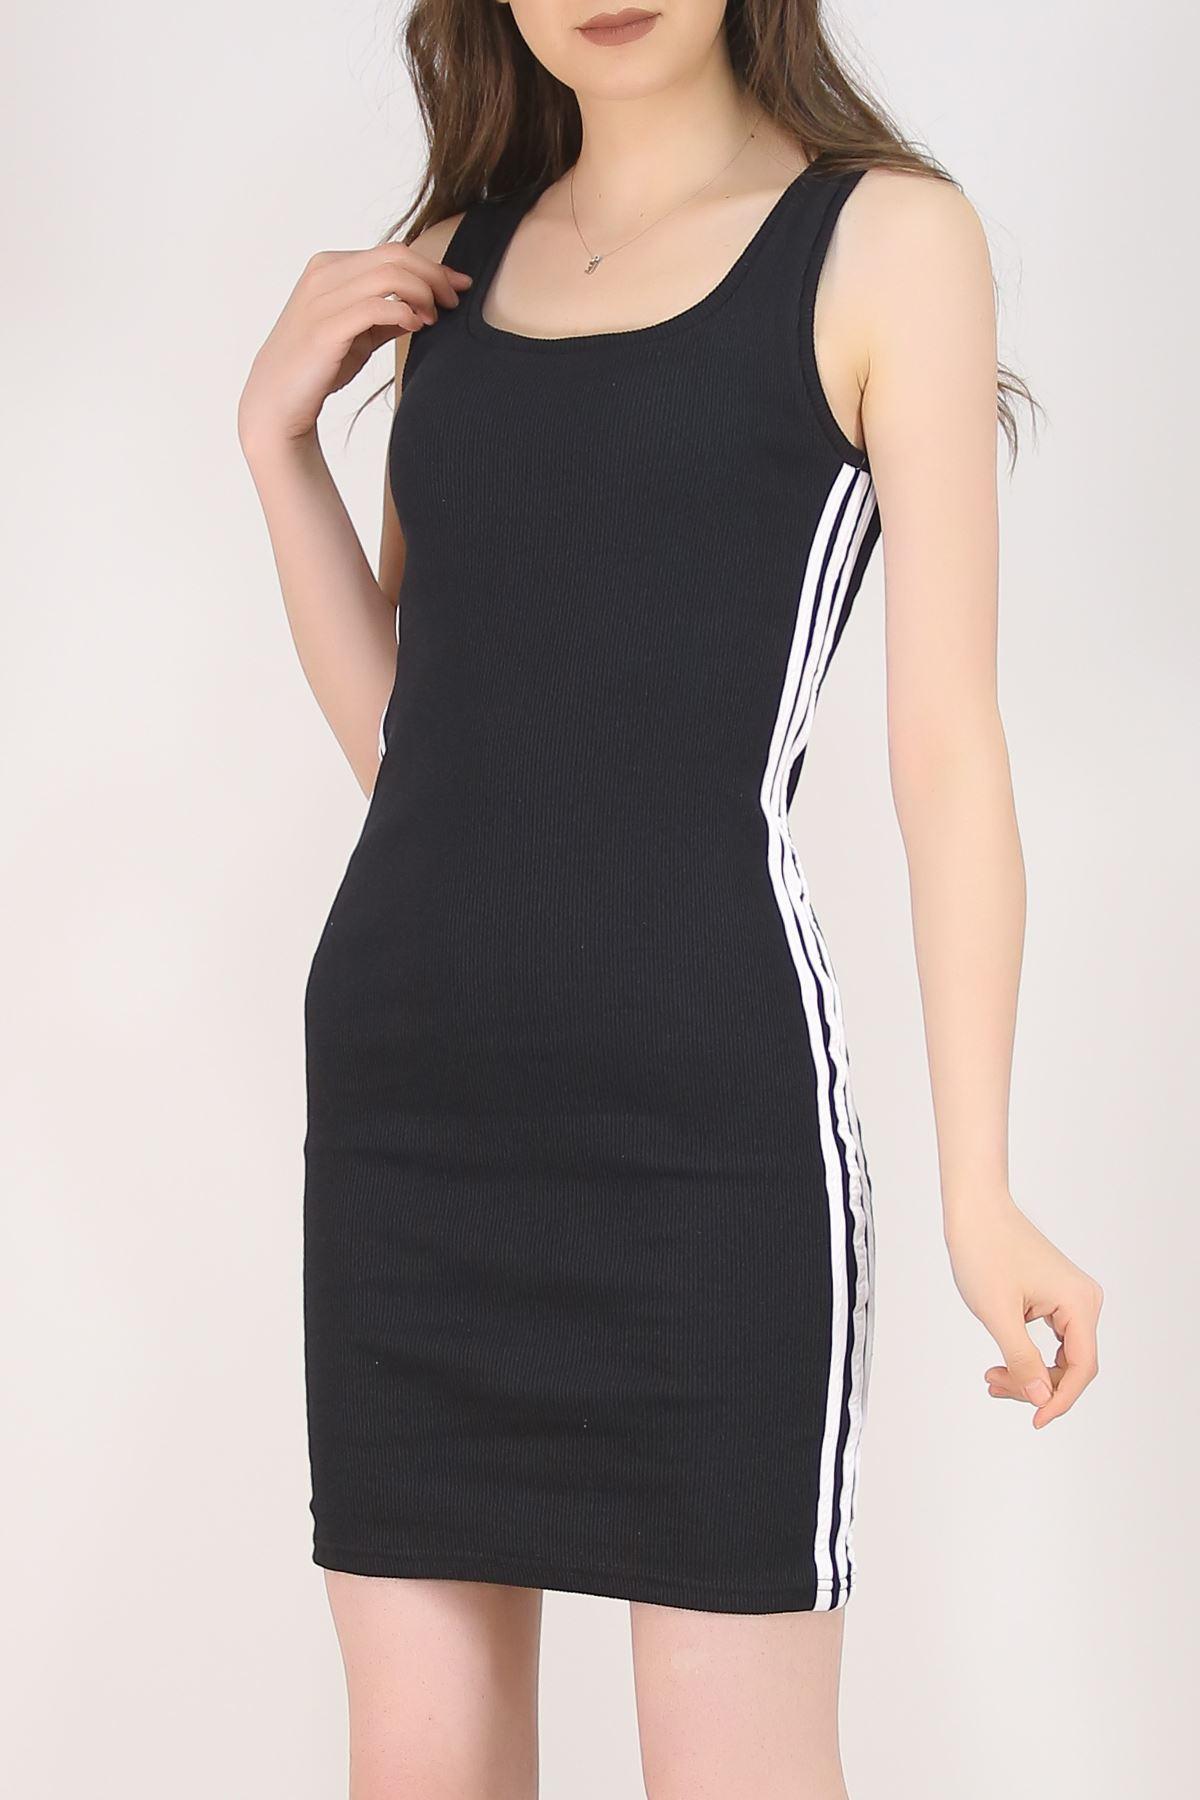 Kaşkorse Şeritli Elbise Siyah - 5693.316.